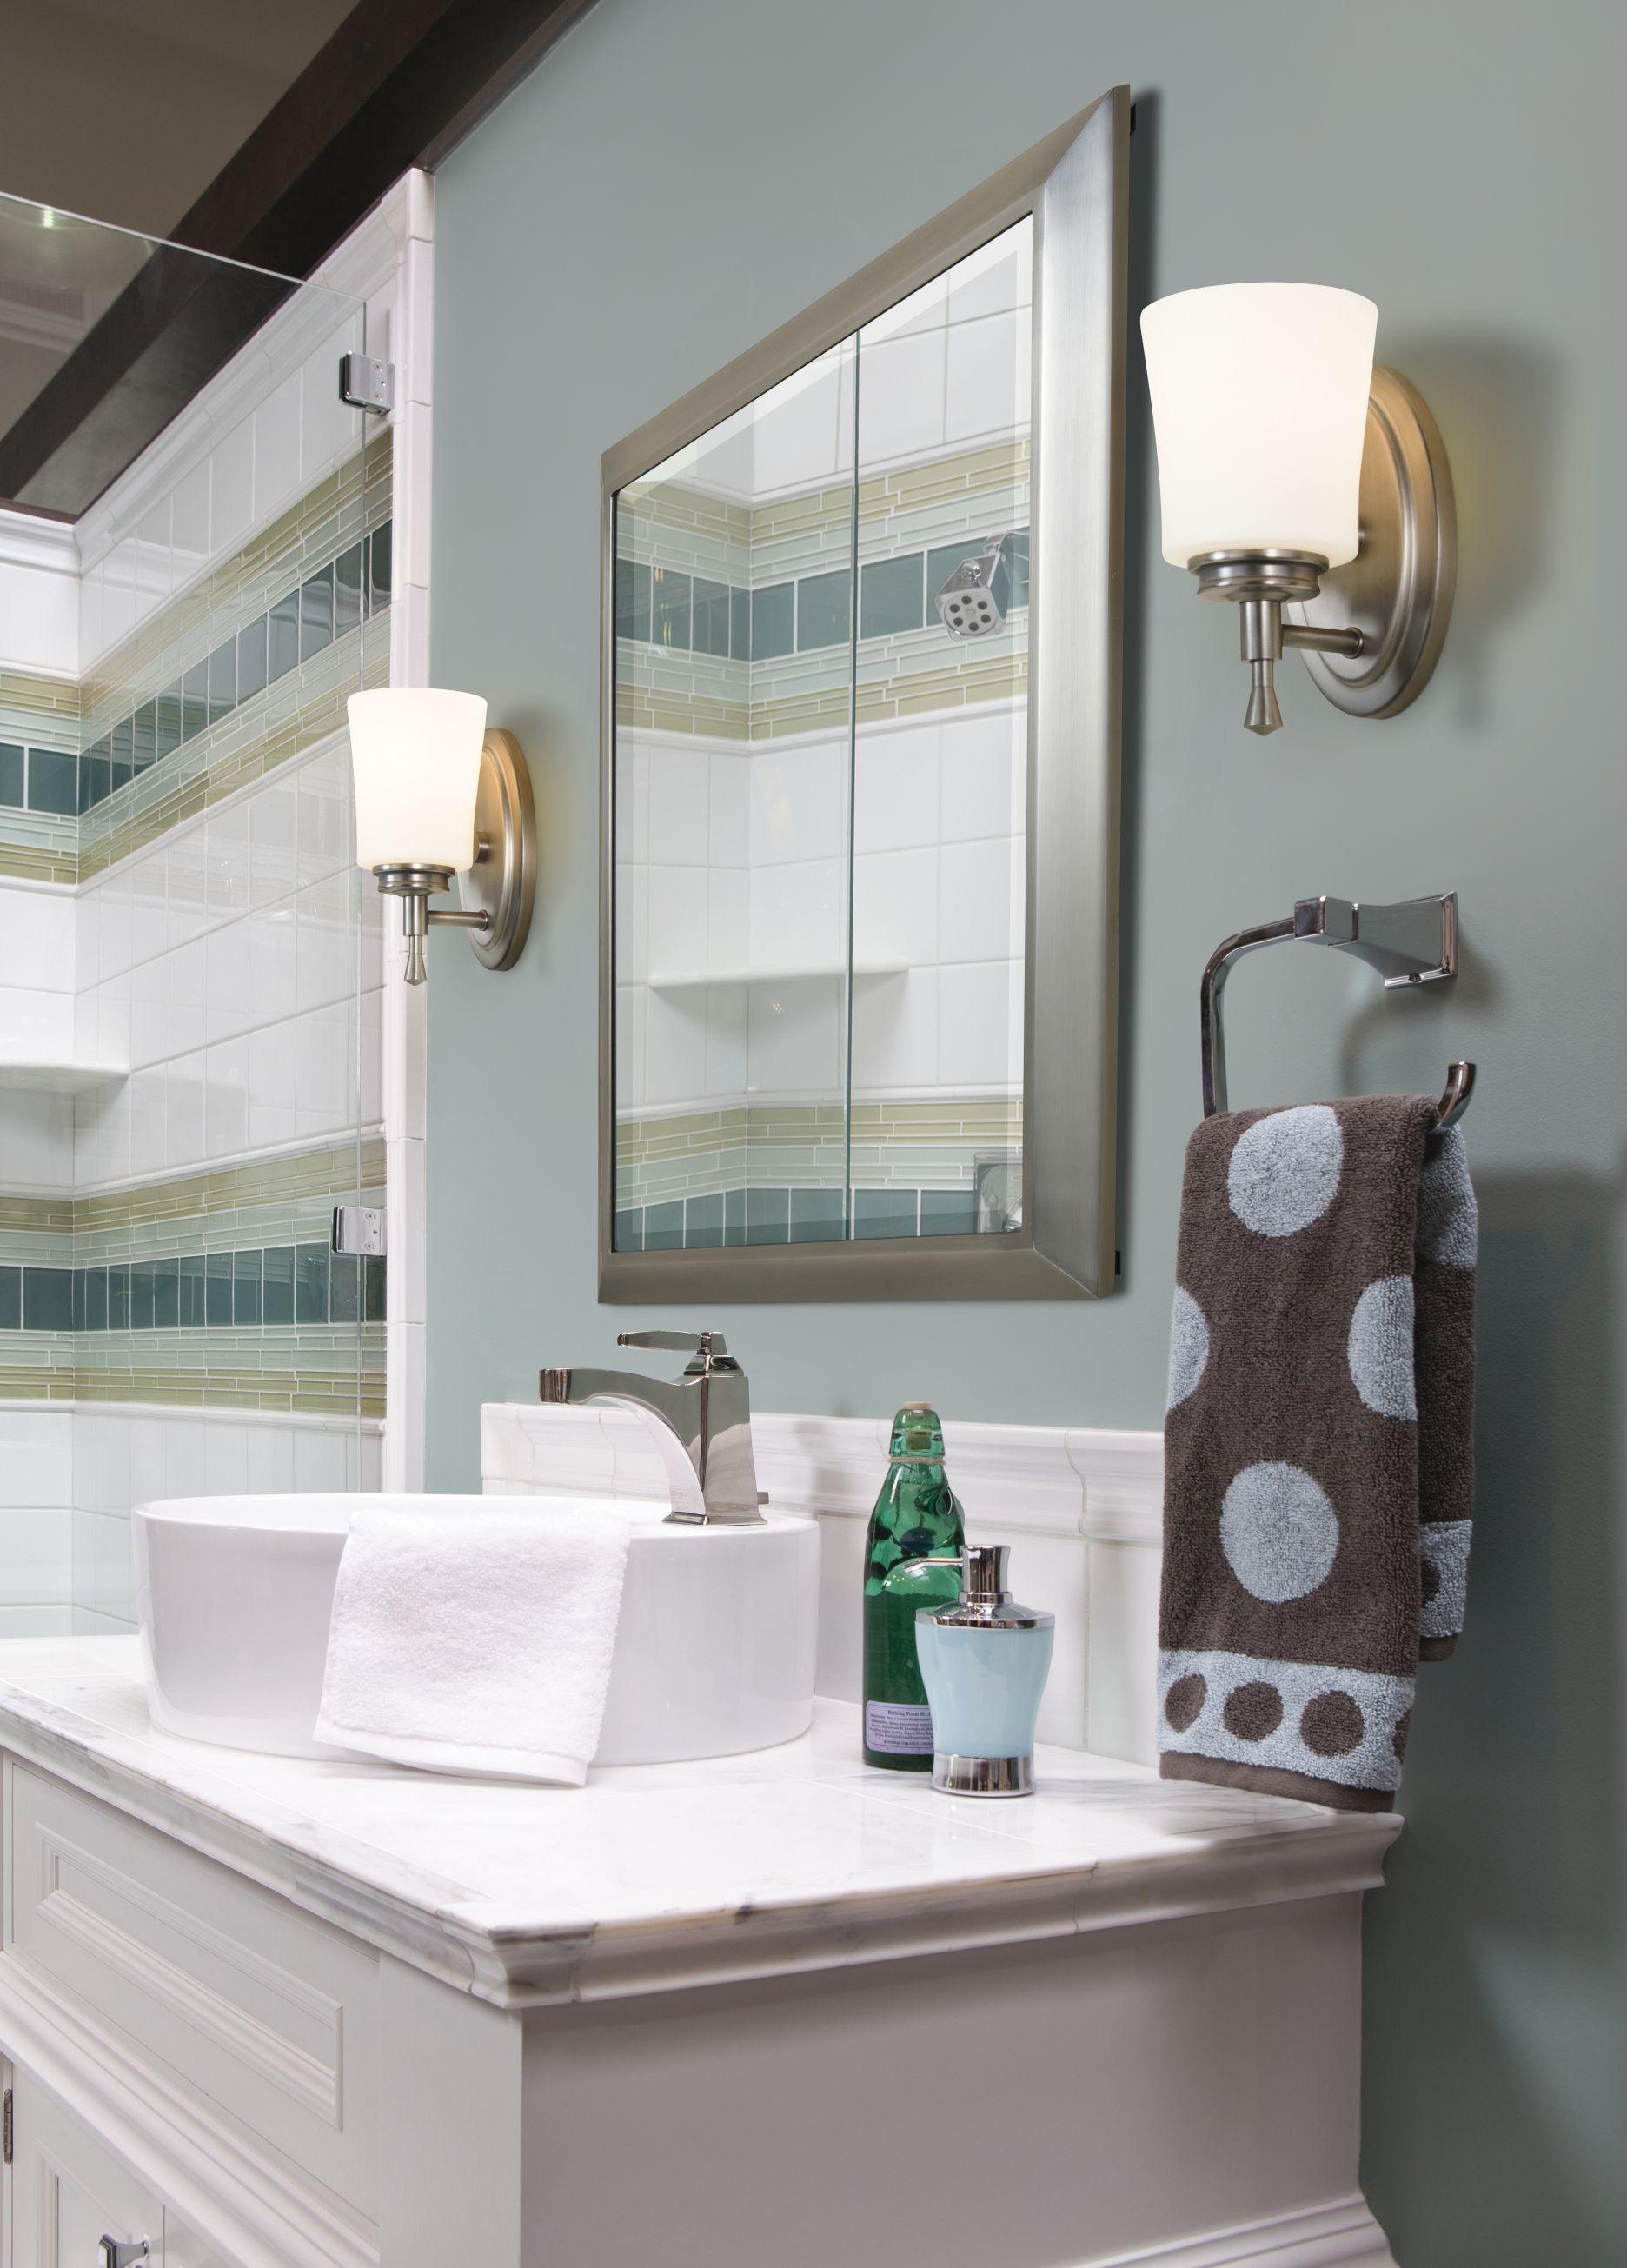 Kichler wharton sconces flank a bathroom vanity bathroomlightingideas bathroomlighting bathlighting kichler lightsonline